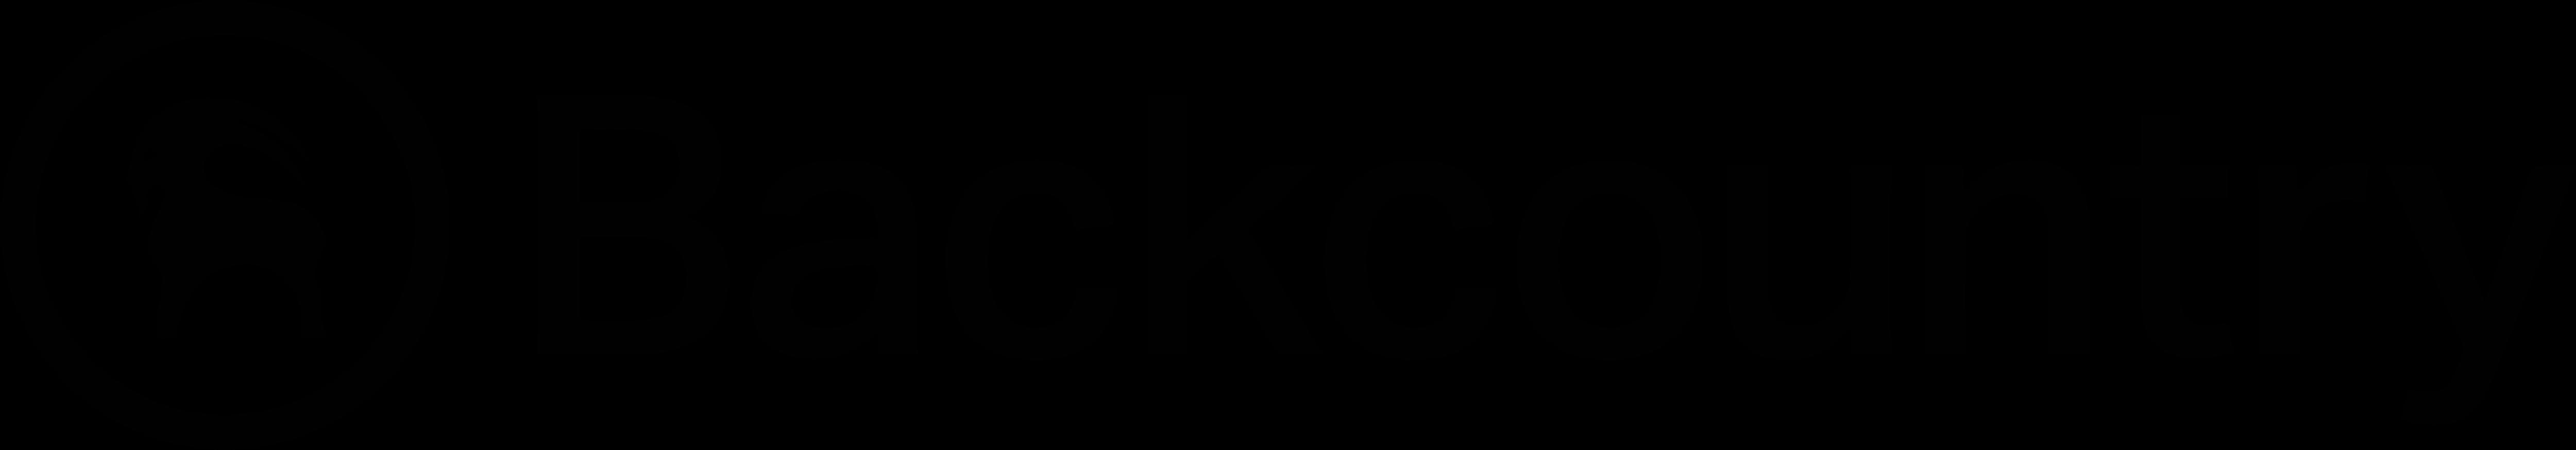 Backcountry – Logos Download